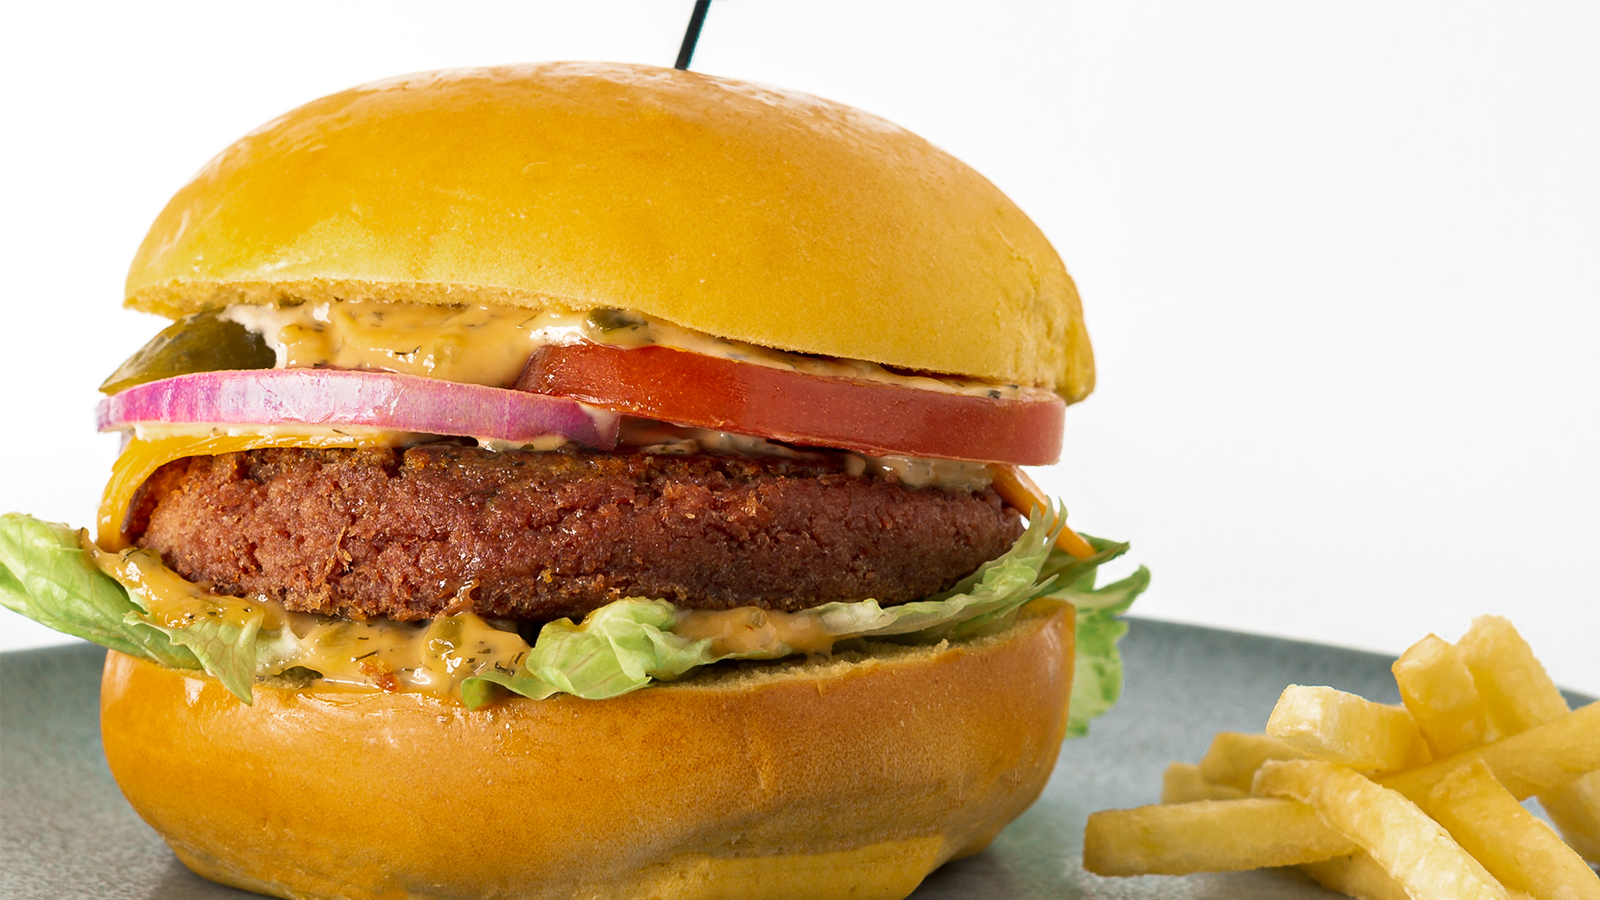 Vegie Magic Choice Beef-Free Burger